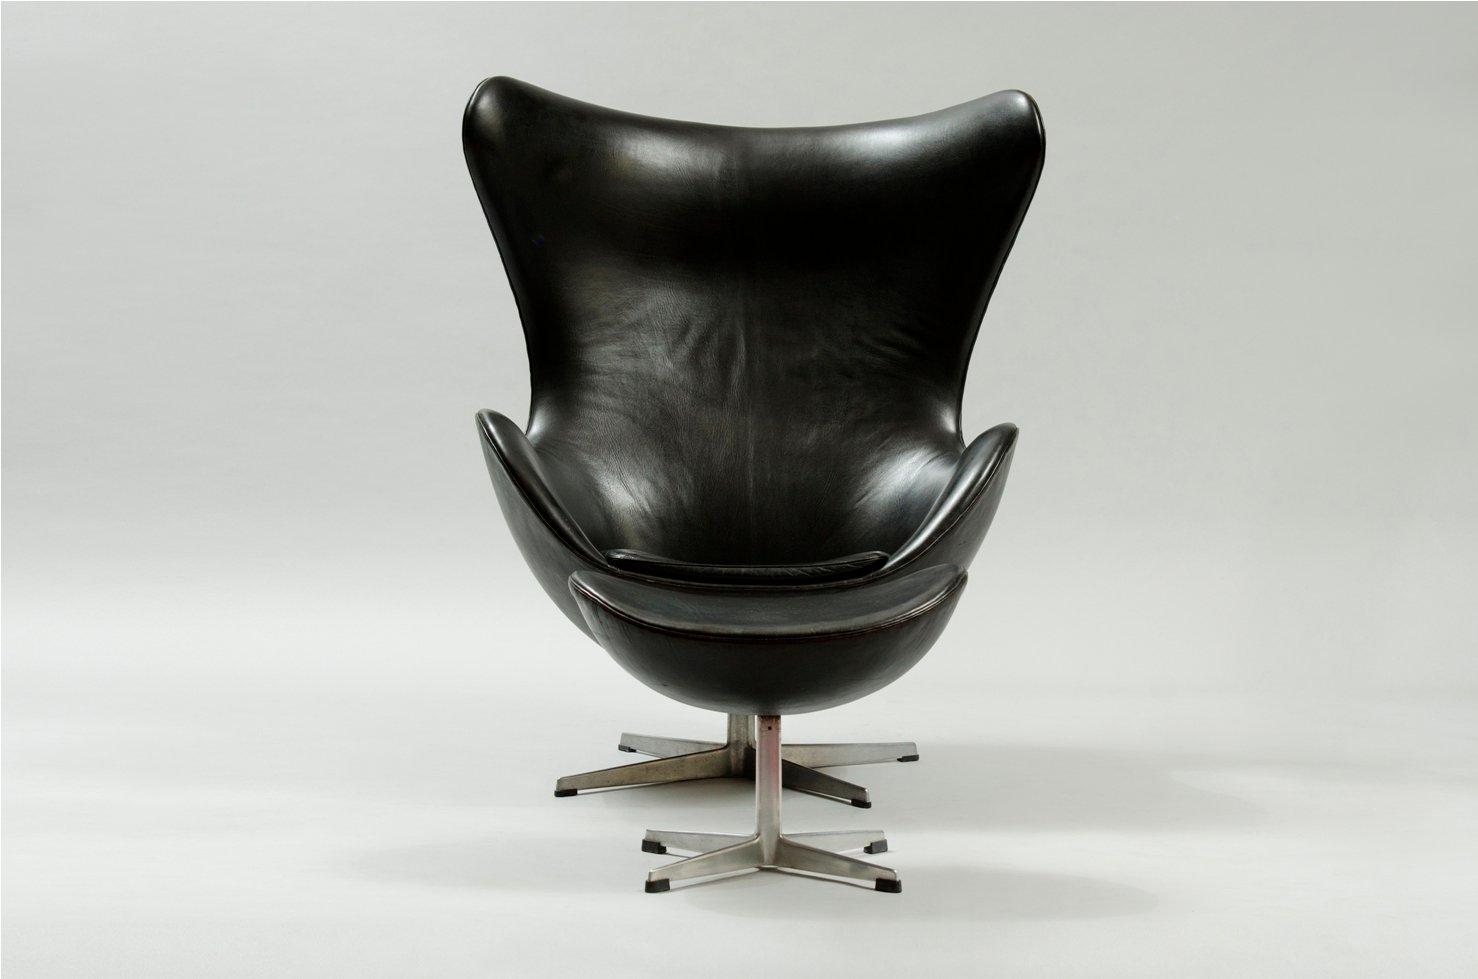 Egg Chair And Ottoman By Arne Jacobsen For Fritz Hansen